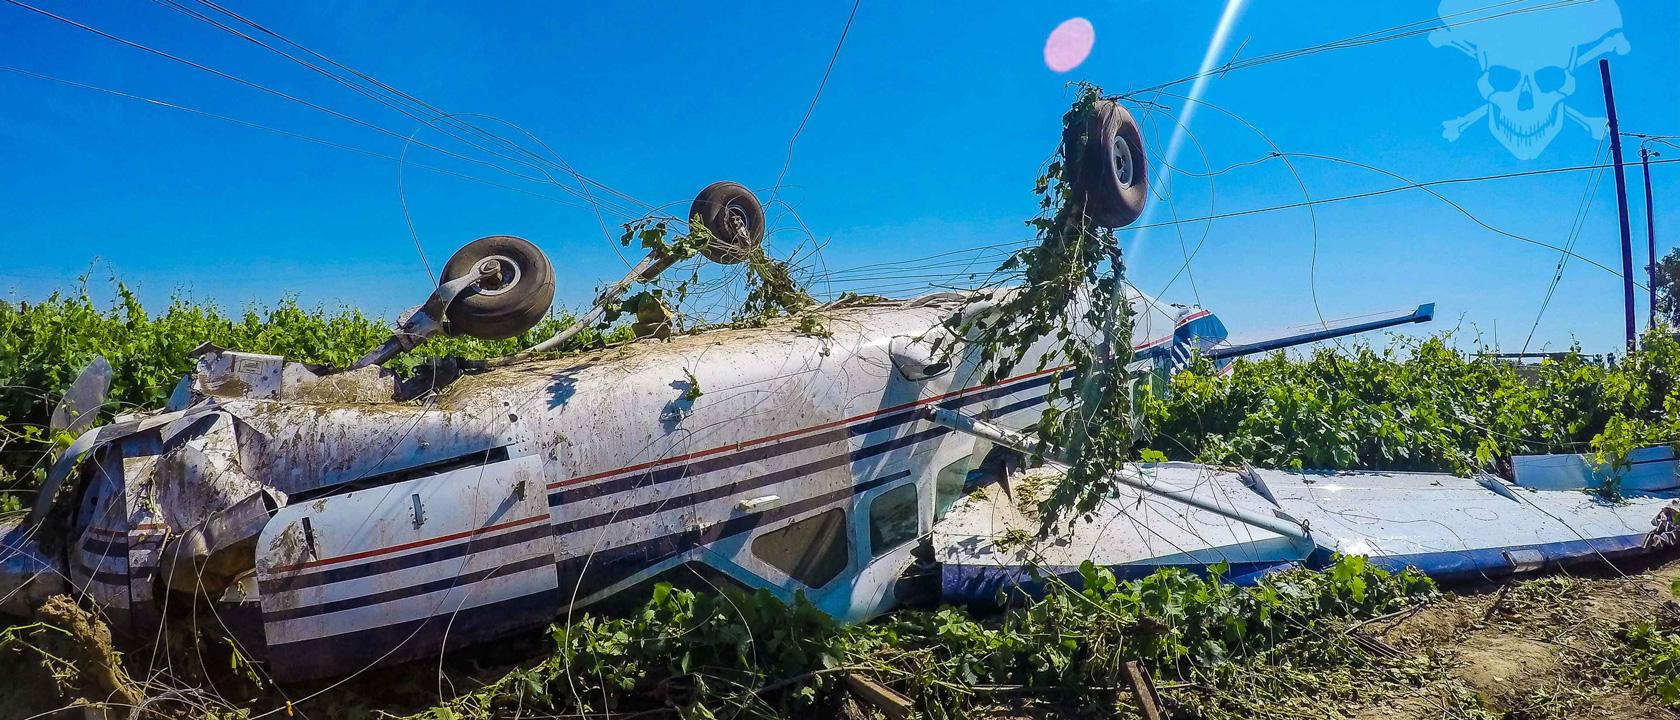 Aircraft Emergencies – Communication Strategies